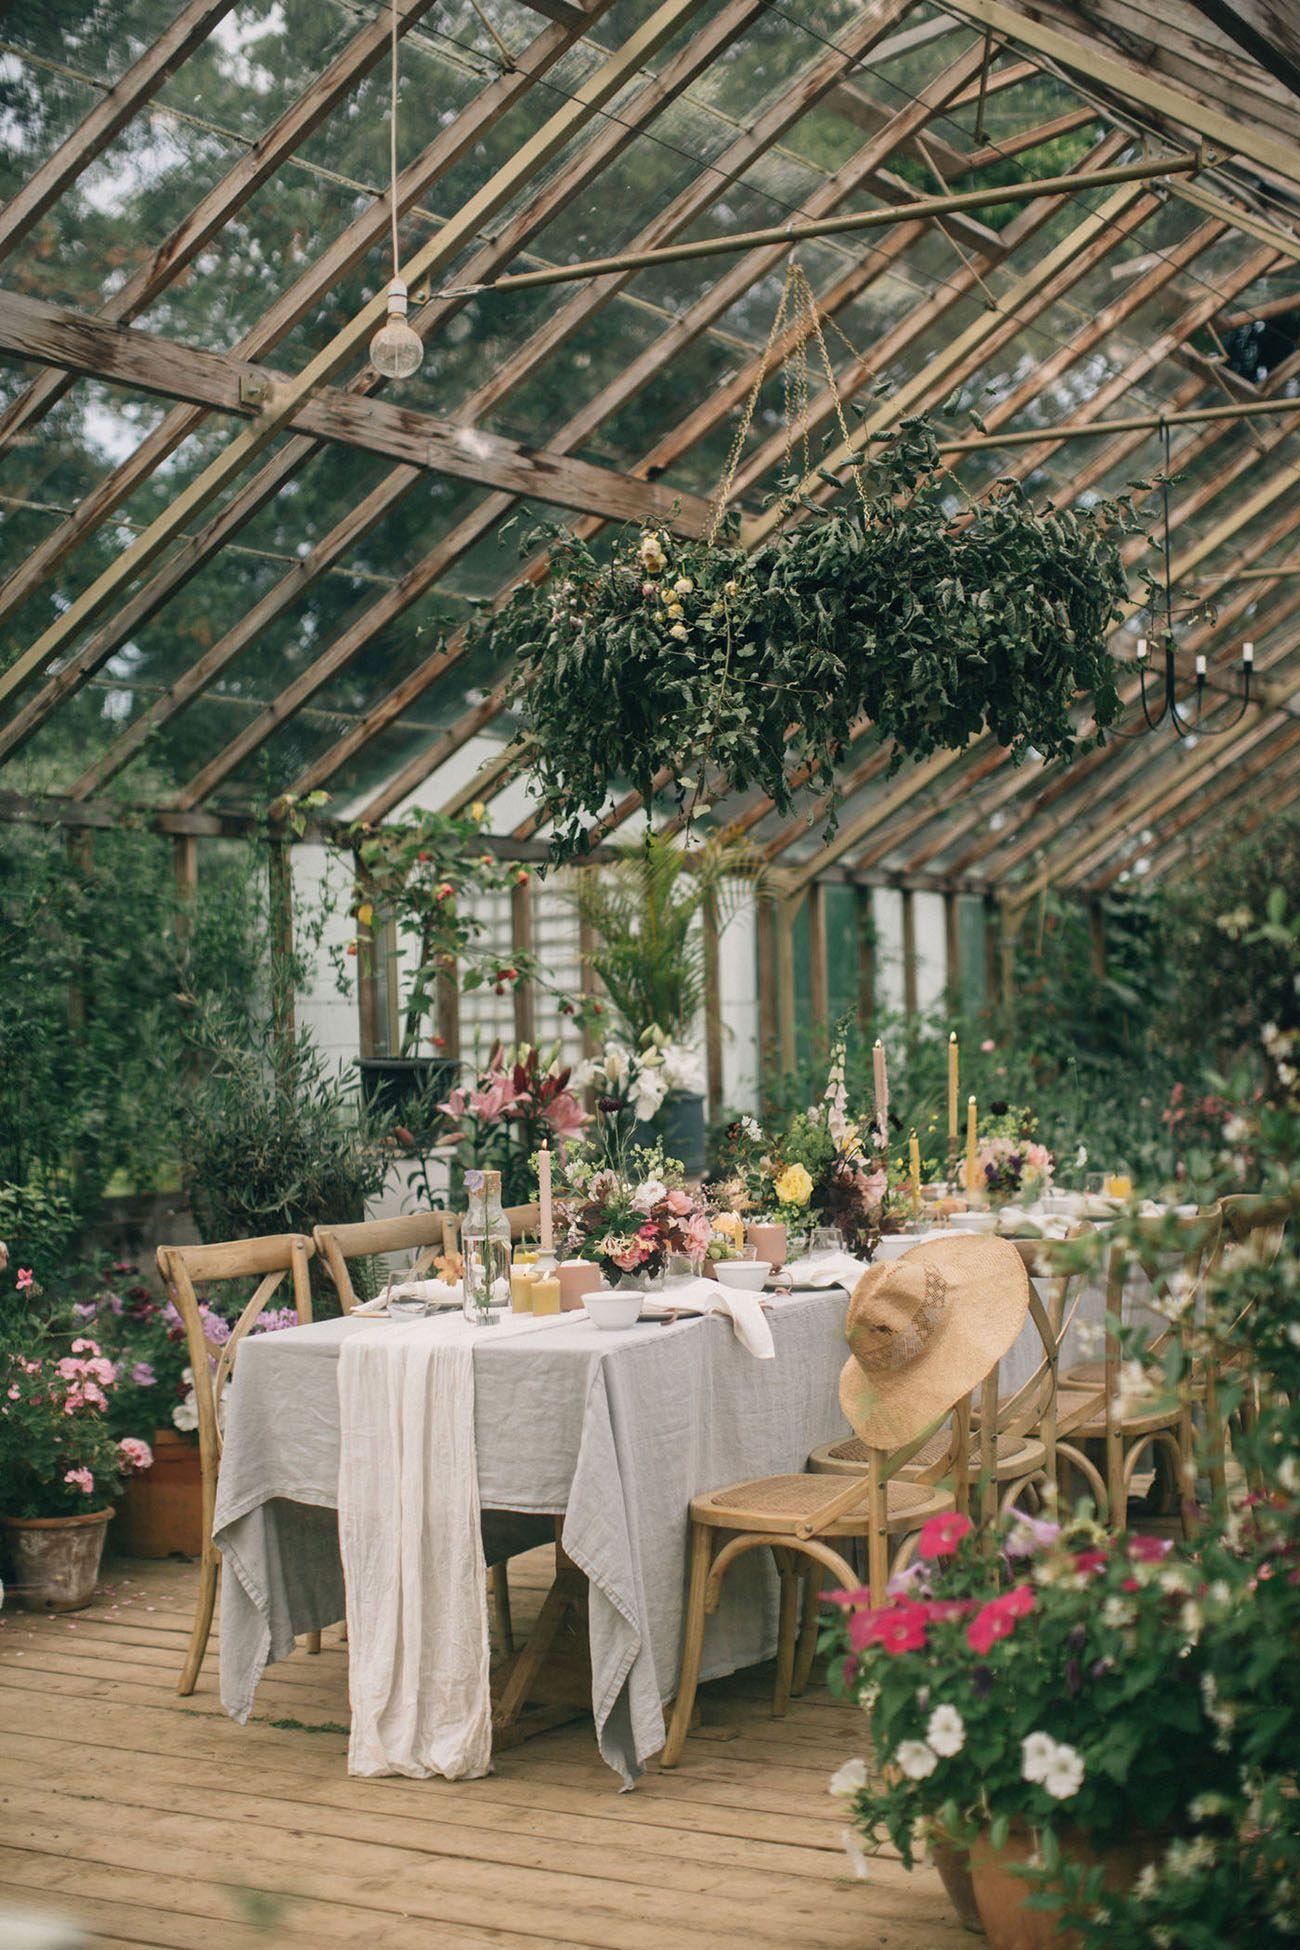 Secret Garden Wedding Inspiration At An 18th Century Irish Greenhouse Green Wedding Shoes In 2020 Secret Garden Wedding Garden Wedding Inspiration Greenhouse Wedding